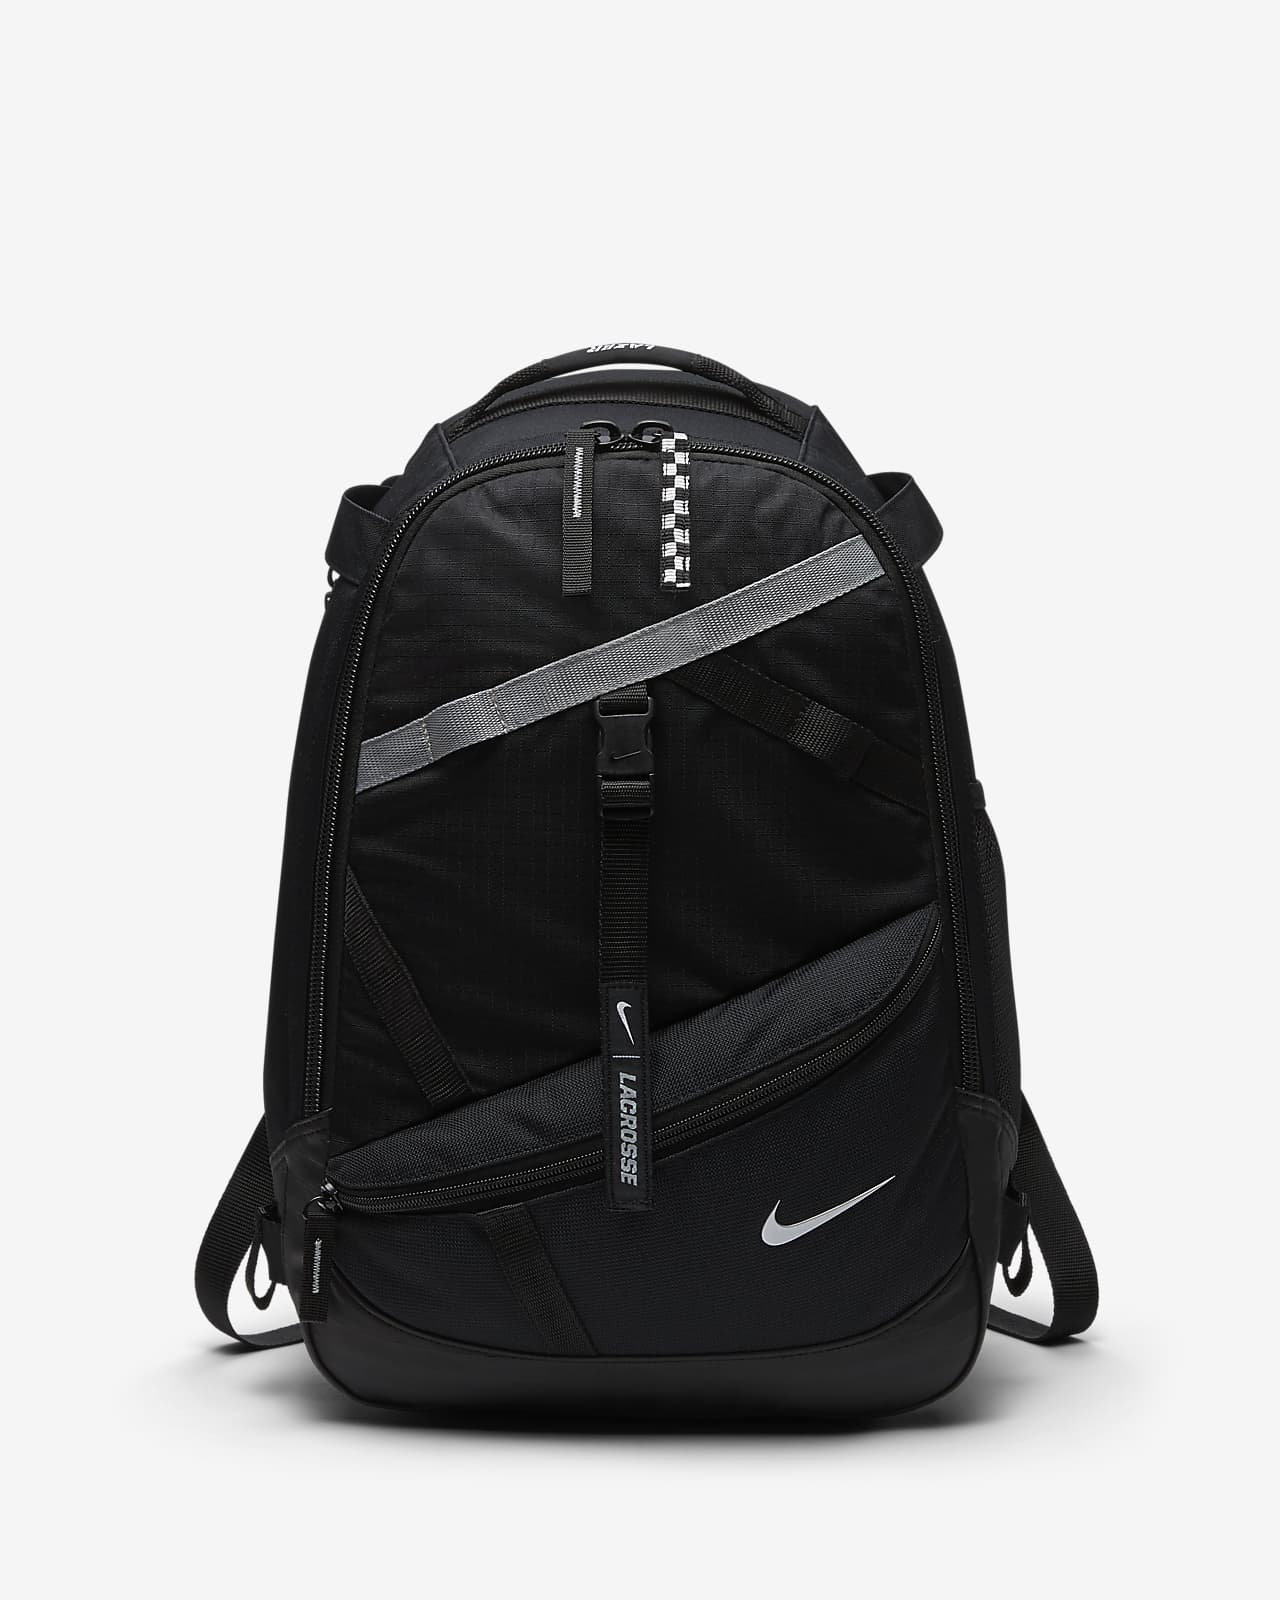 Nike Lazer Lacrosse Backpack